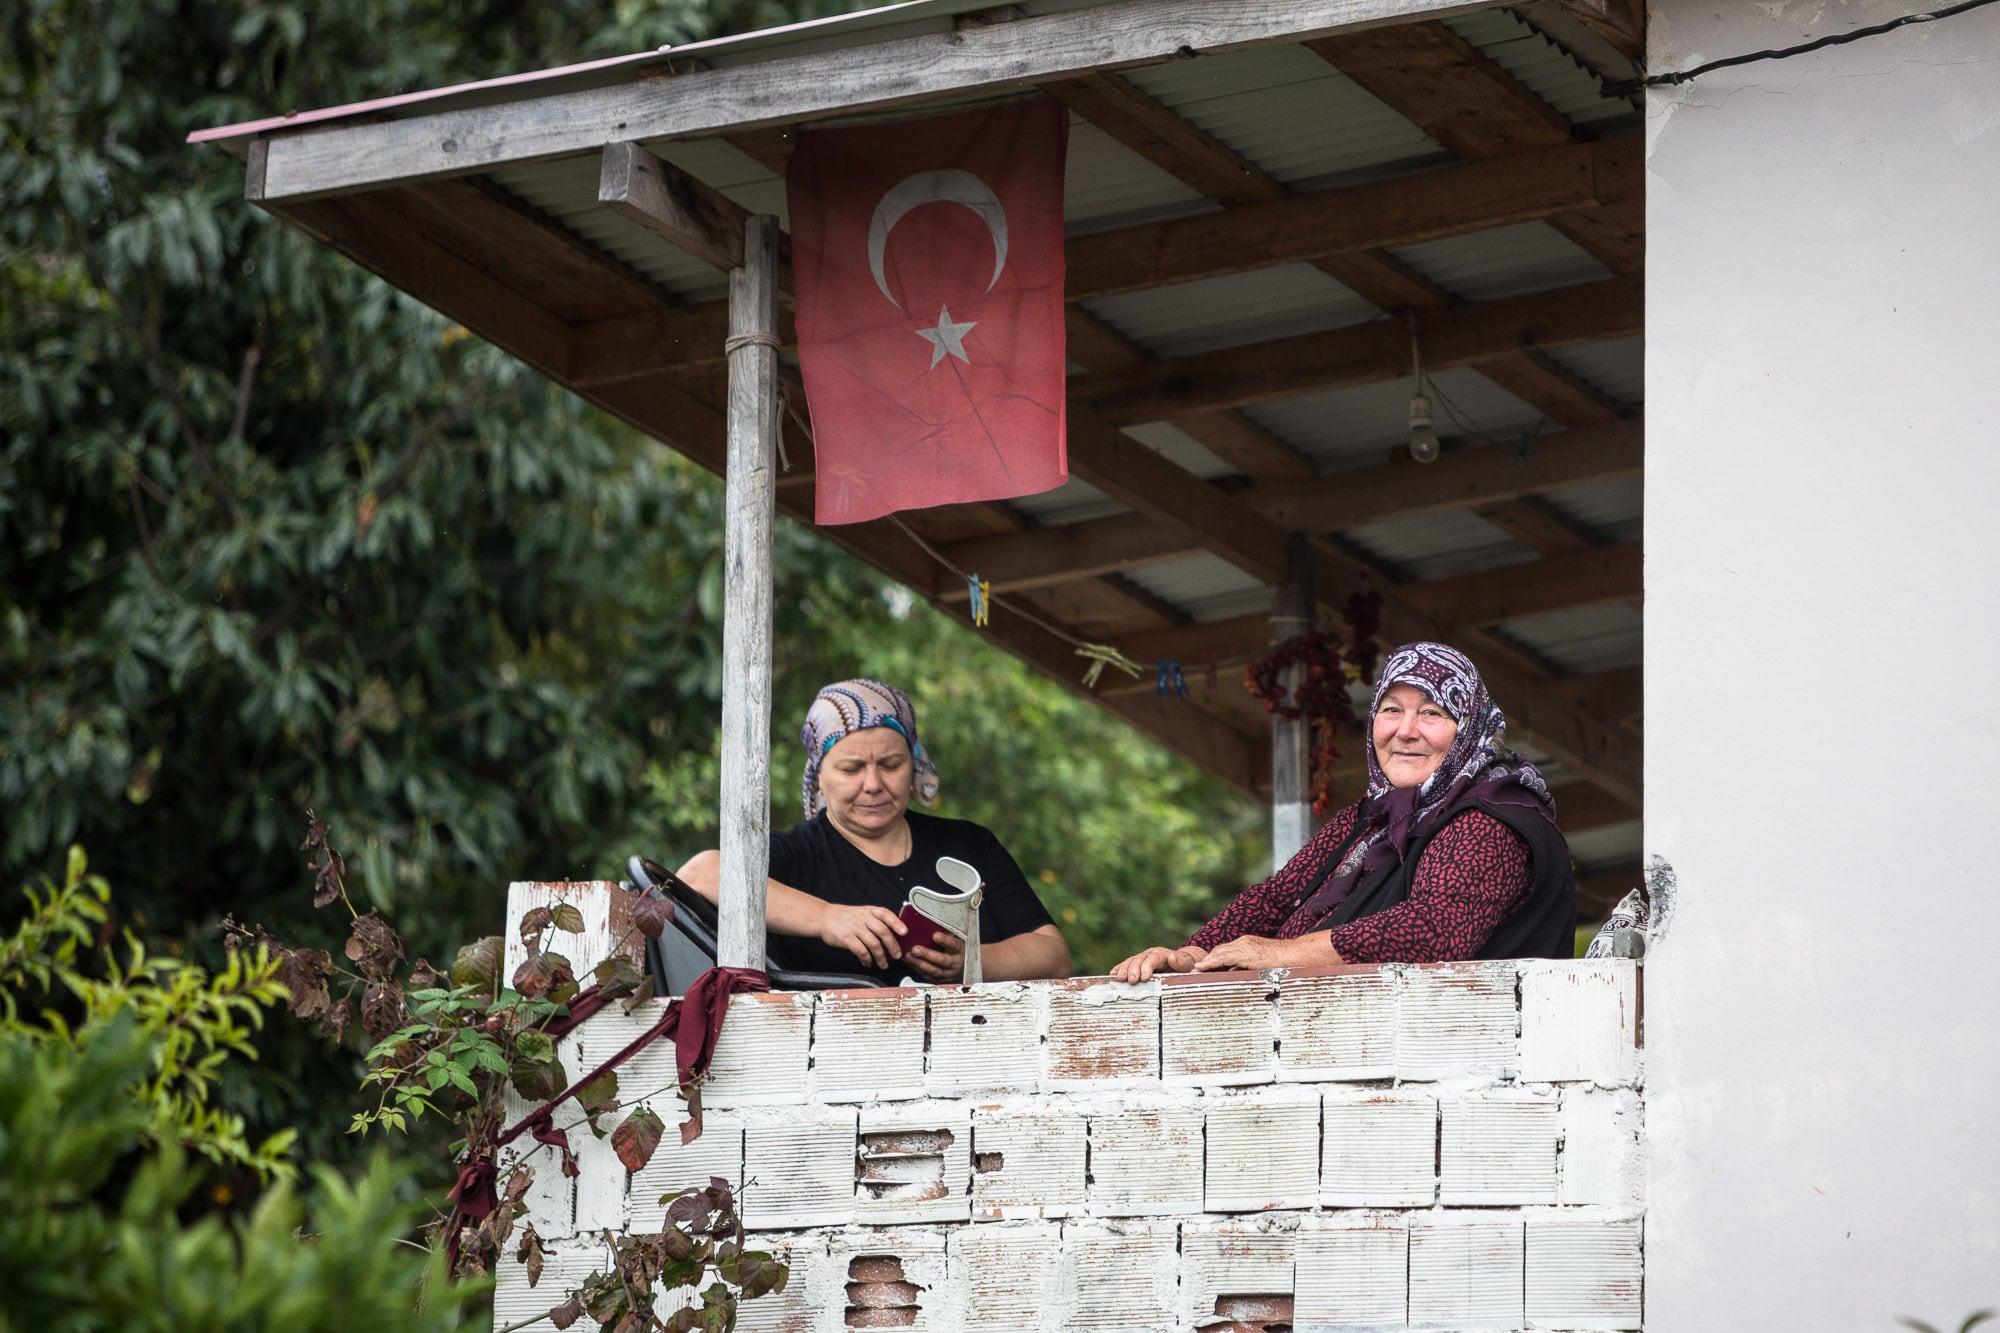 Turkish ladies